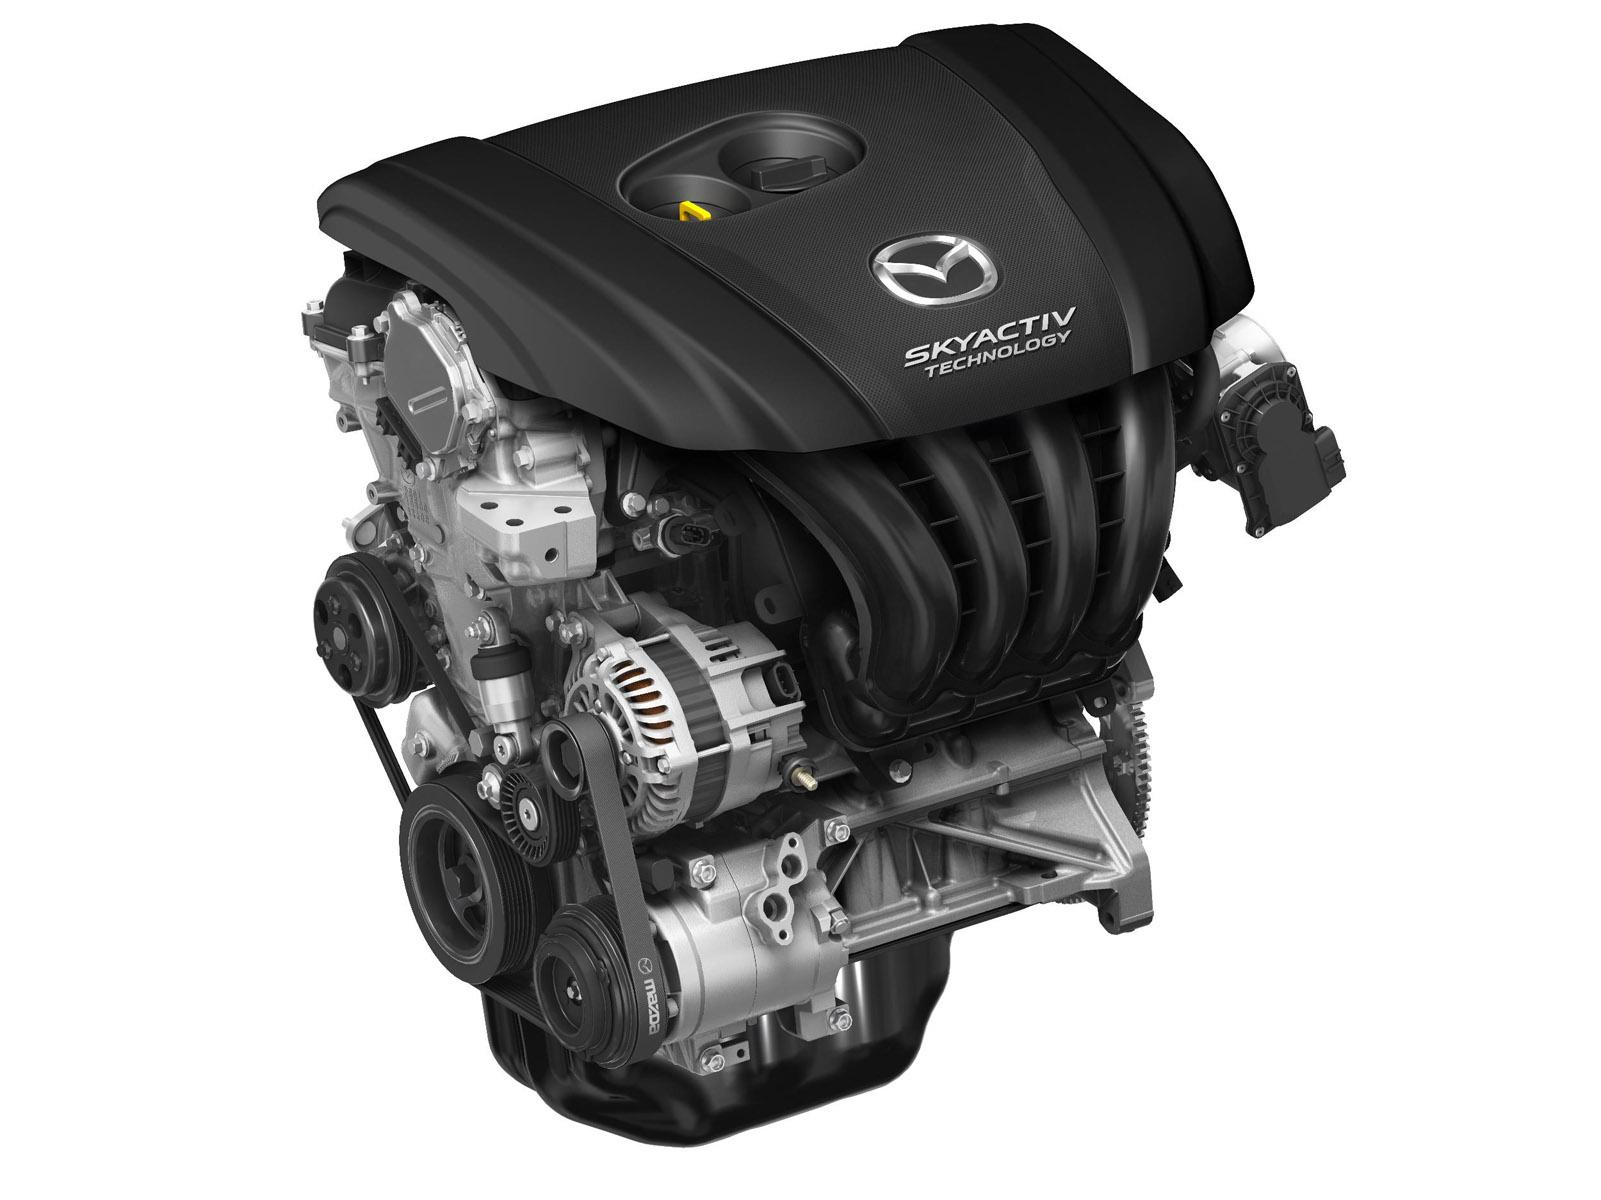 1908_588675_Mazda6_2012_technical_01_SKYACTIV-G_2_0